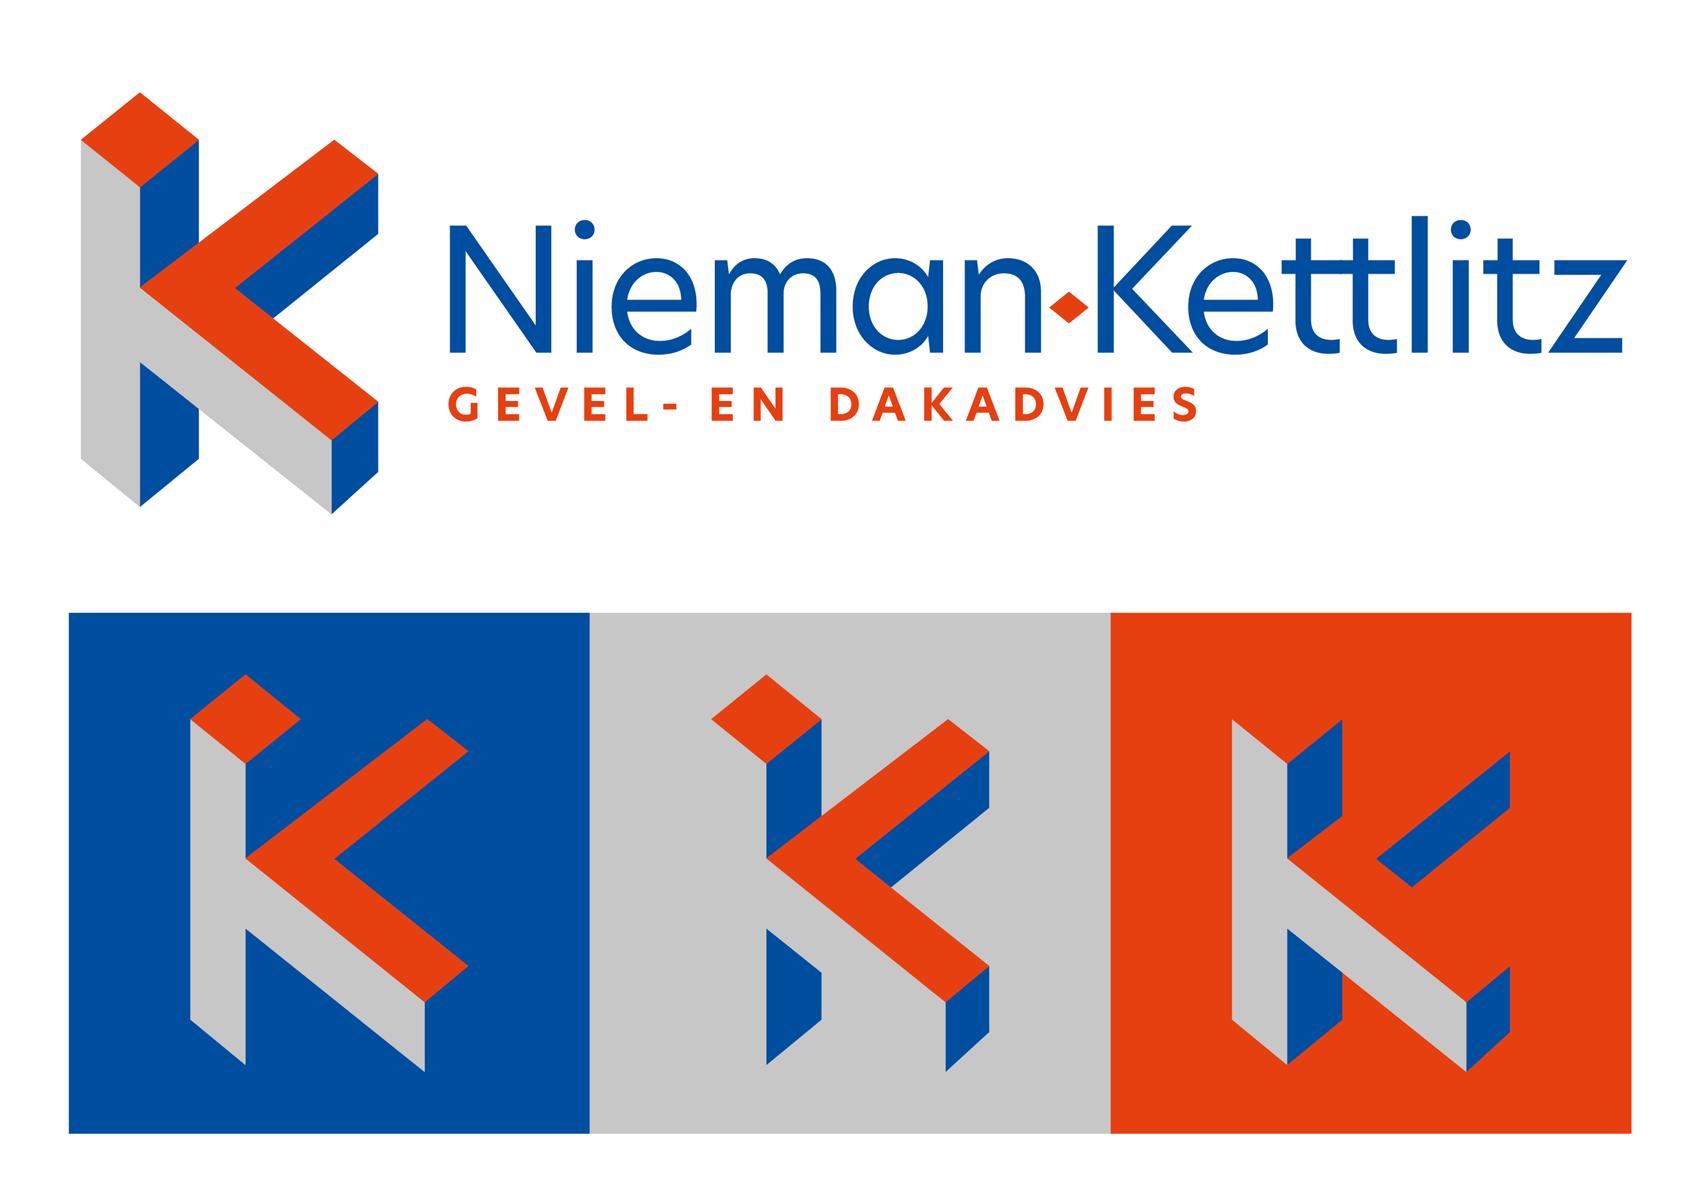 Huisstjil_Nieman_Kettlitz_logo